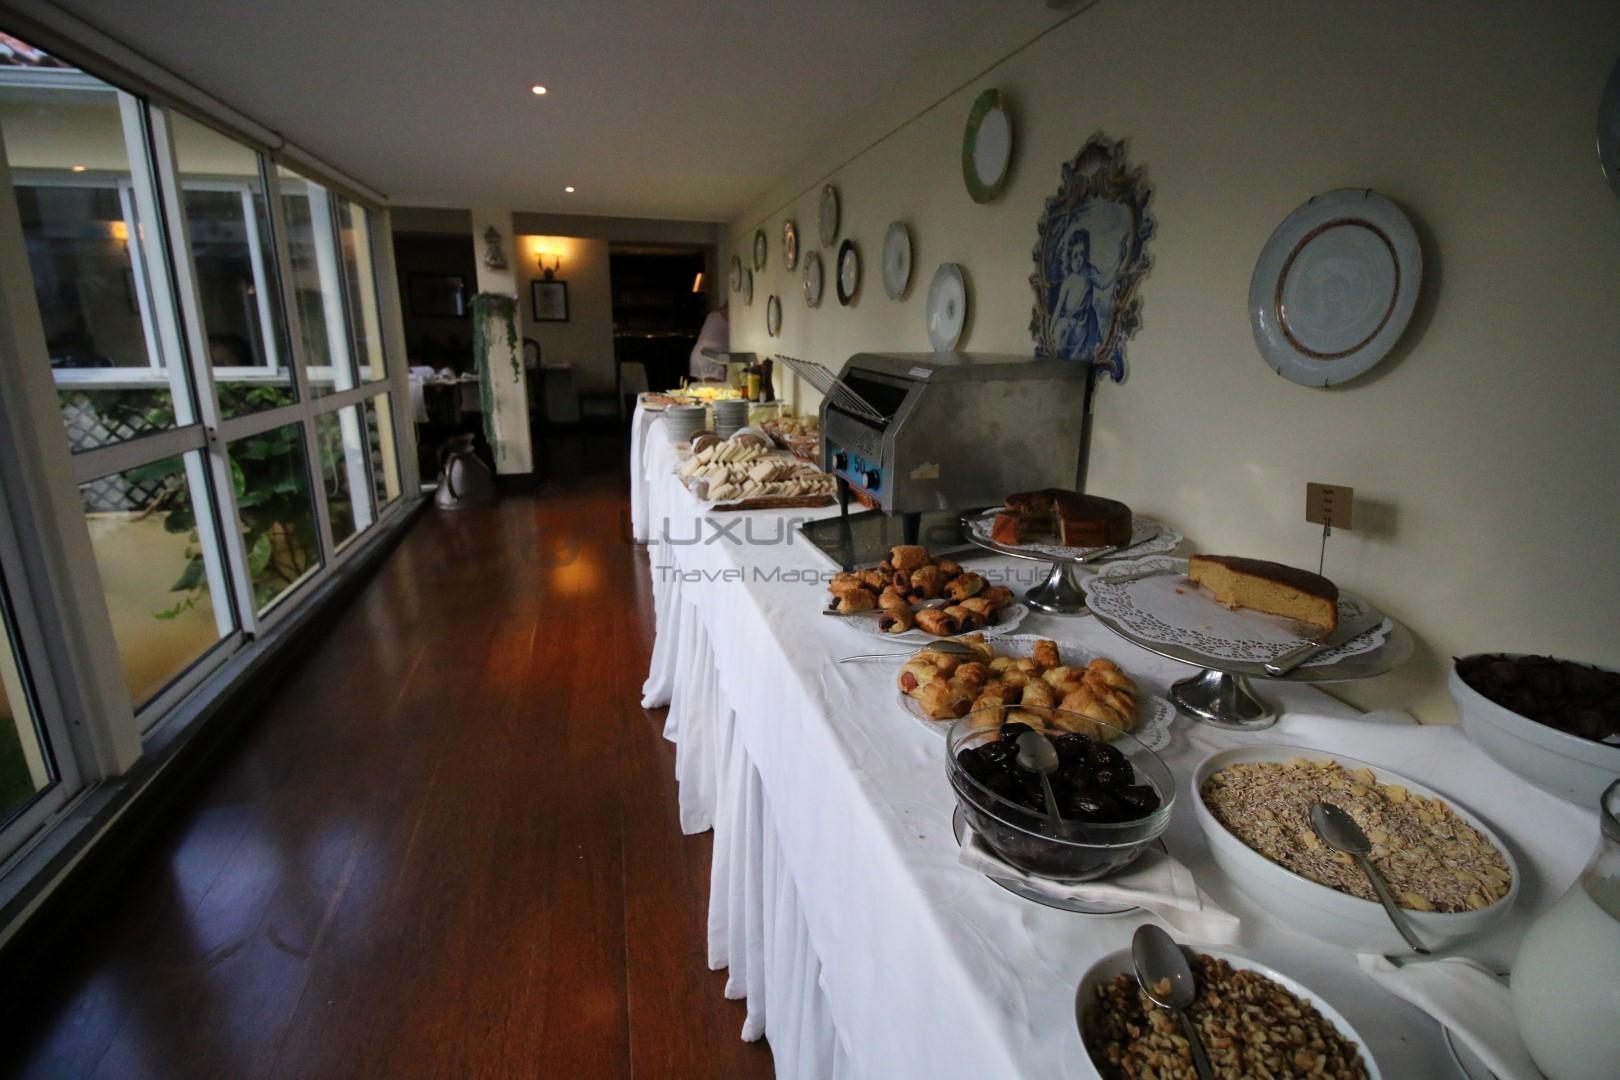 quintinha_sao_joao_funchal_madeira_hotel_price_breakfast